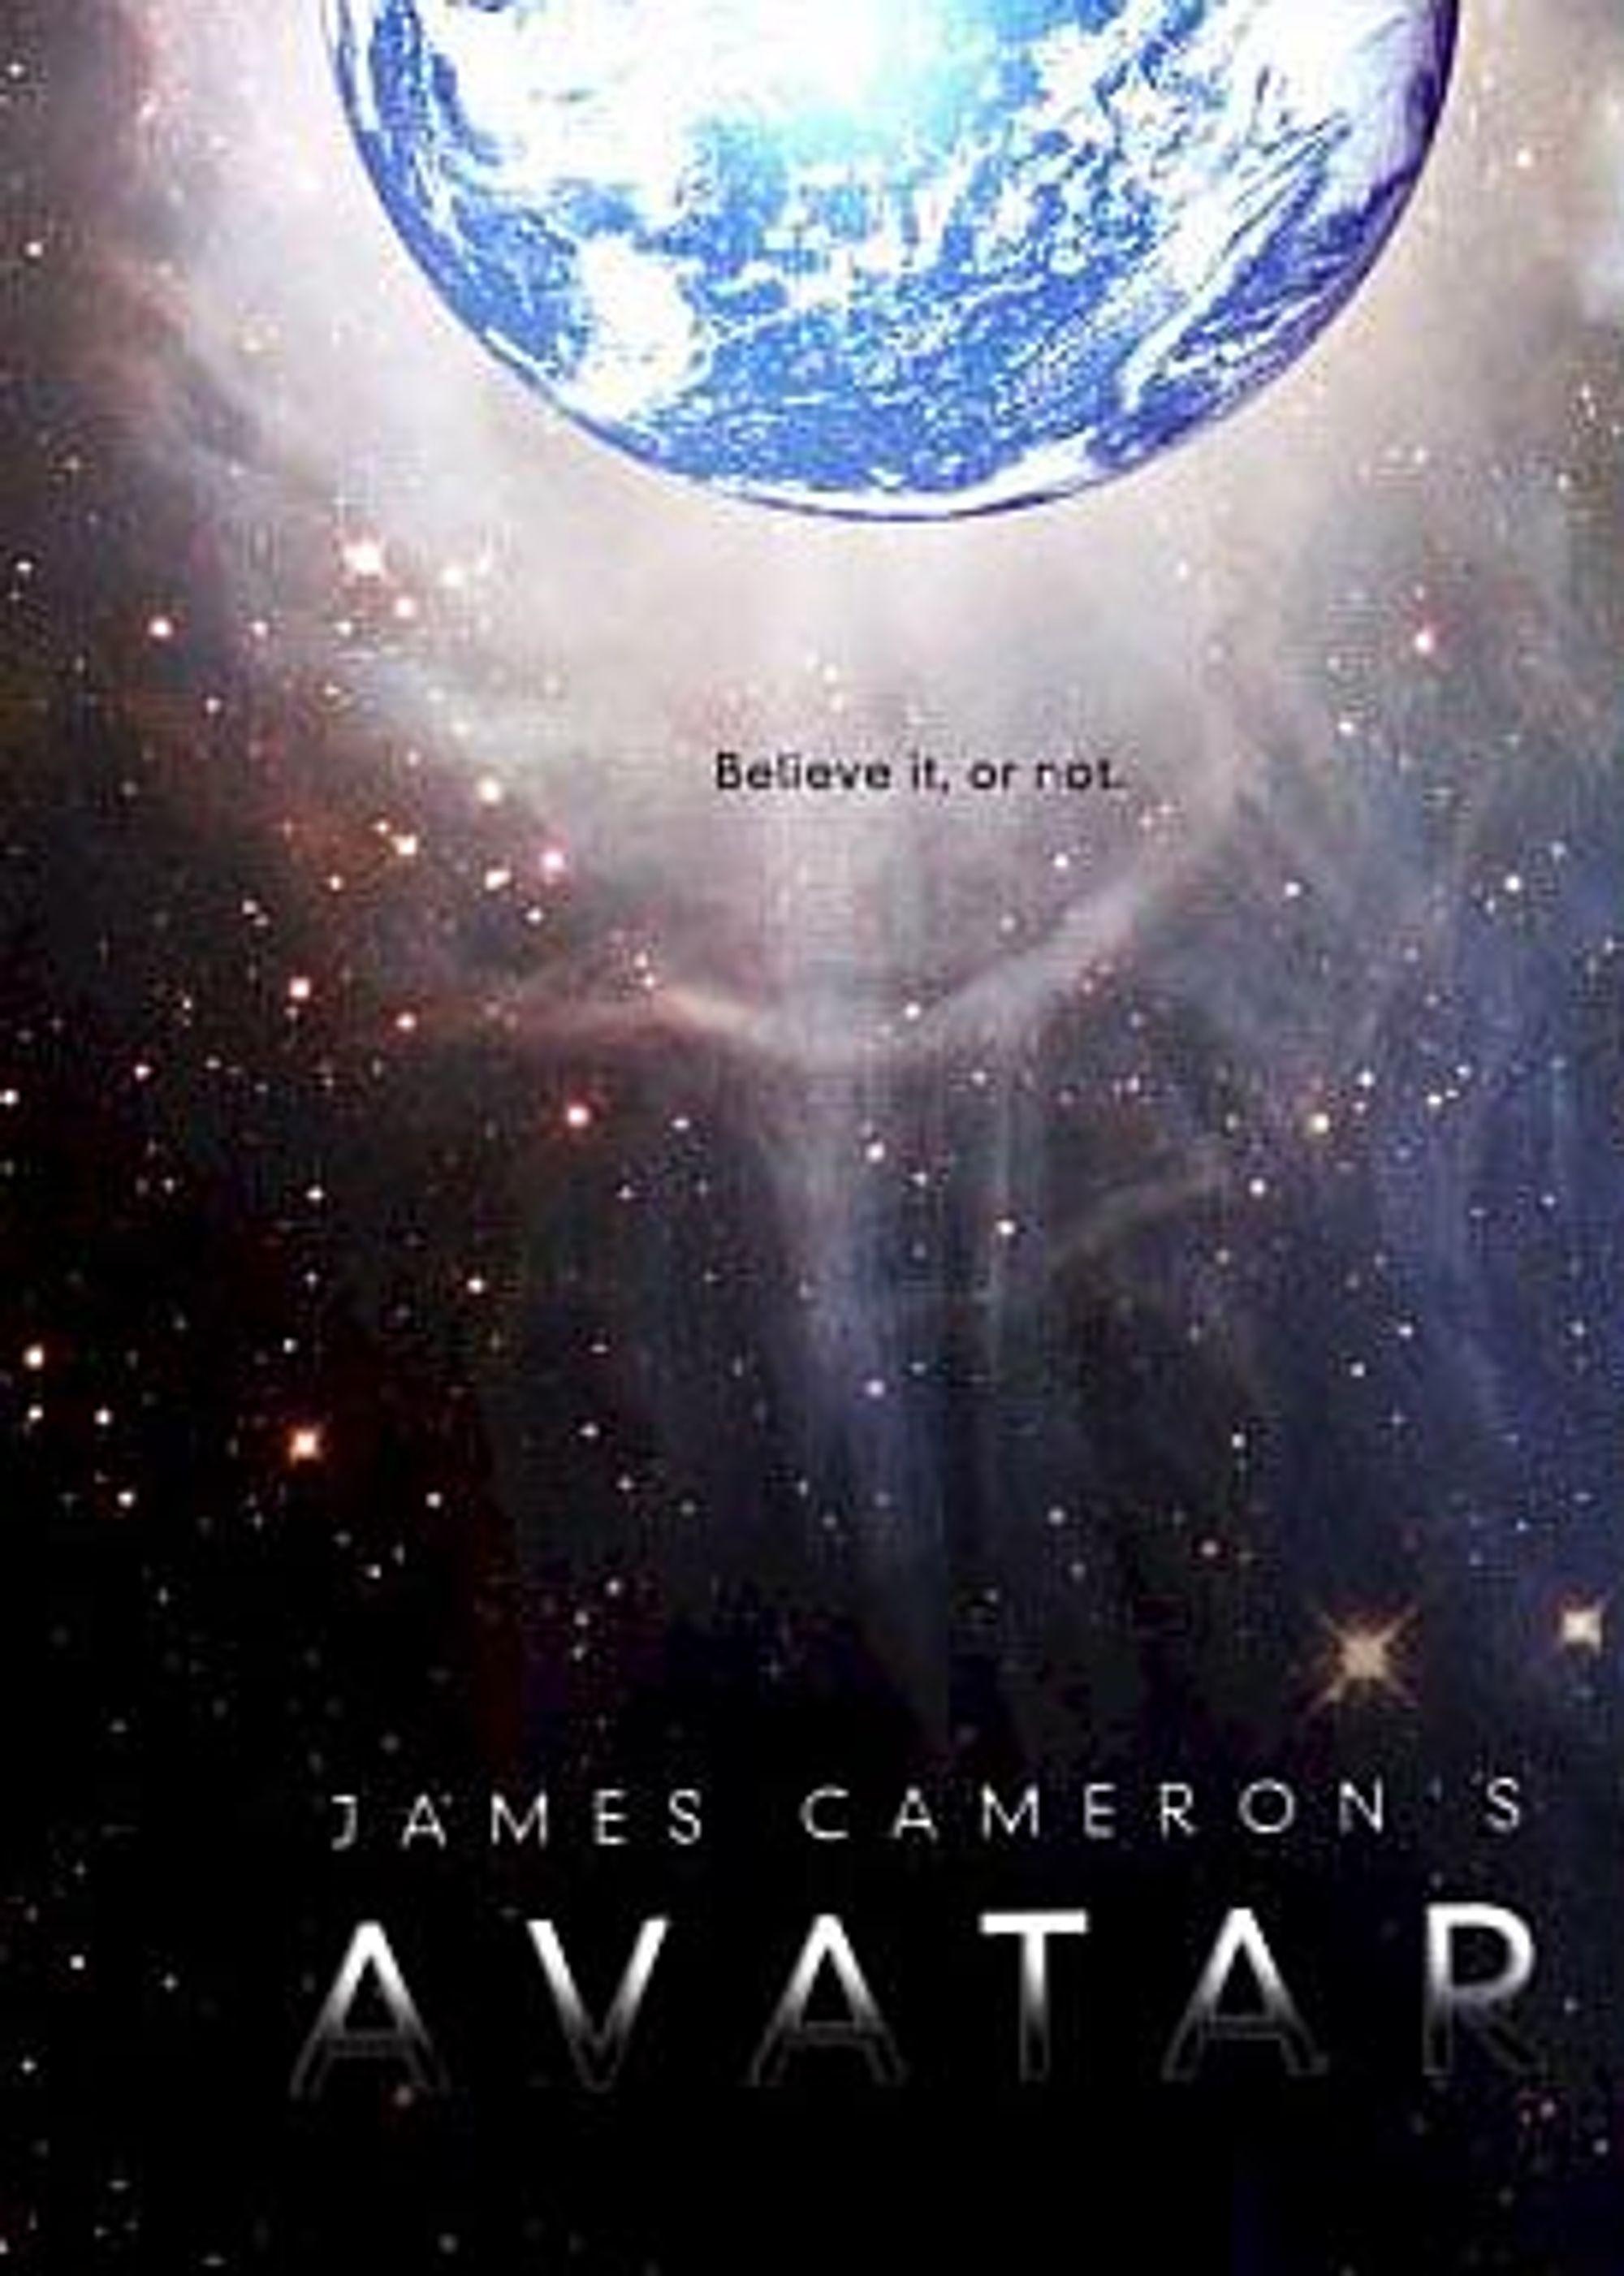 Dette skal være plakaten til Camerons kommende film.